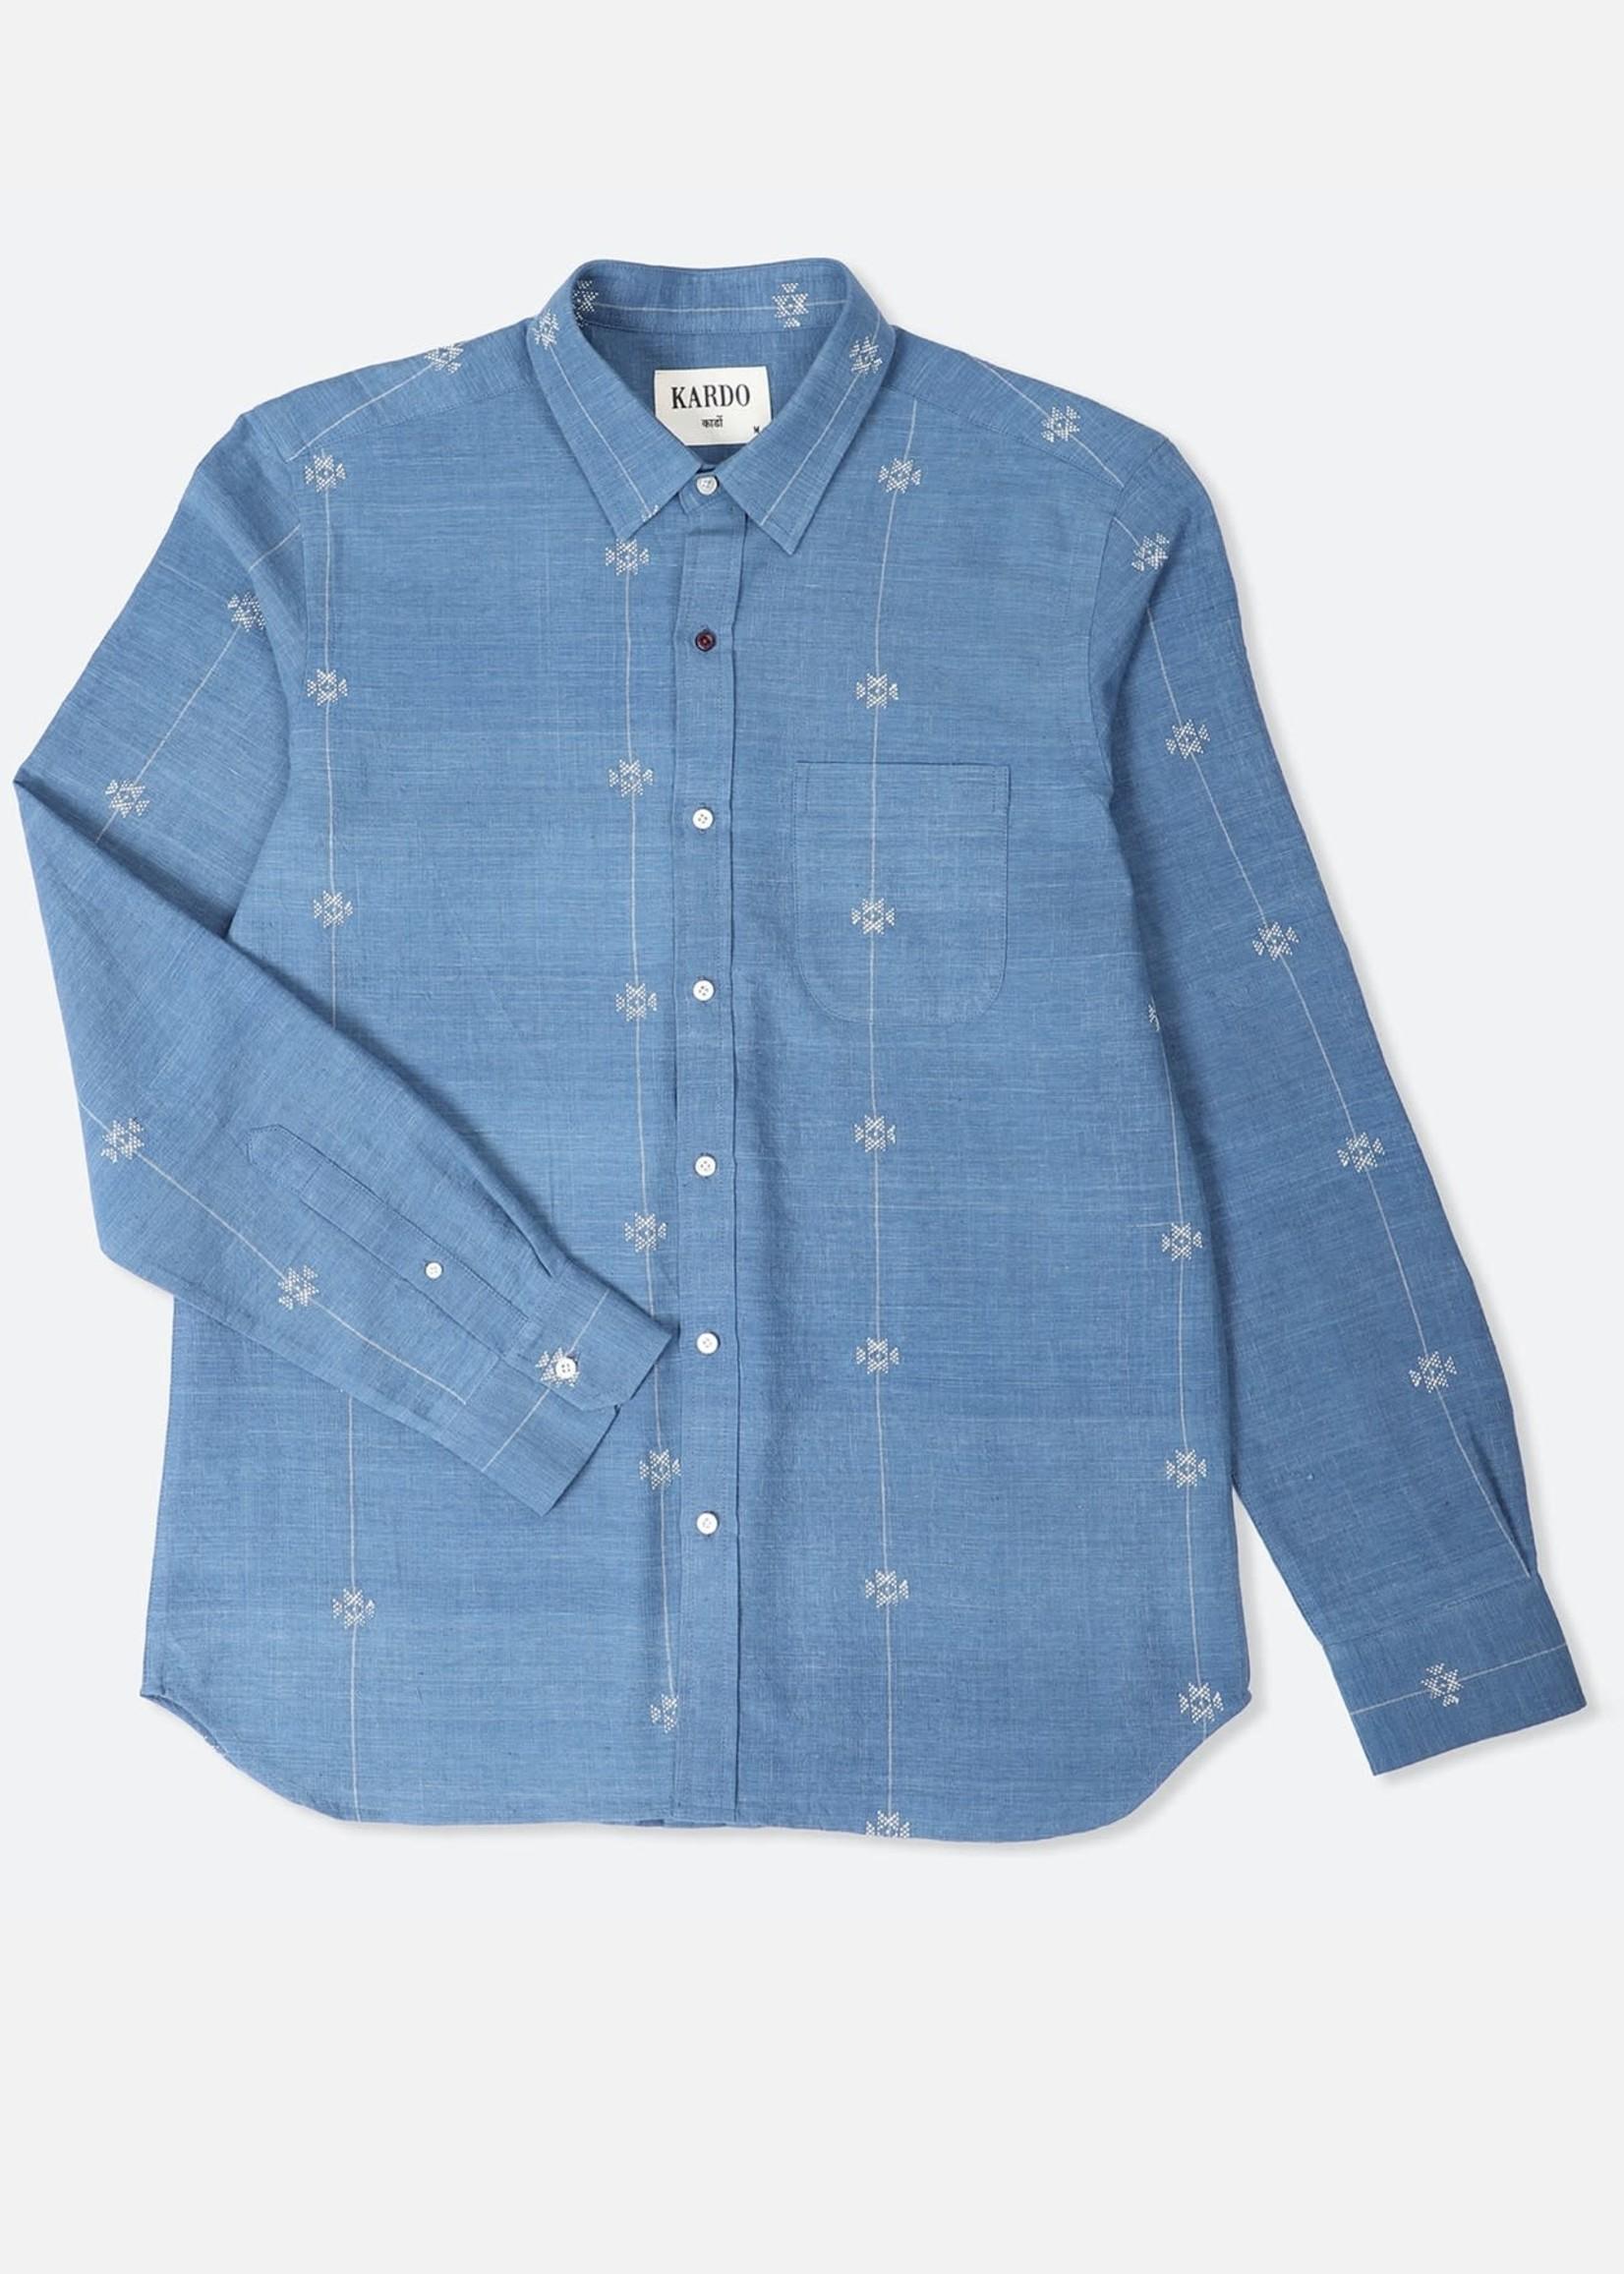 Kardo Kardo Rodney Blue Embroidered Shirt L/S